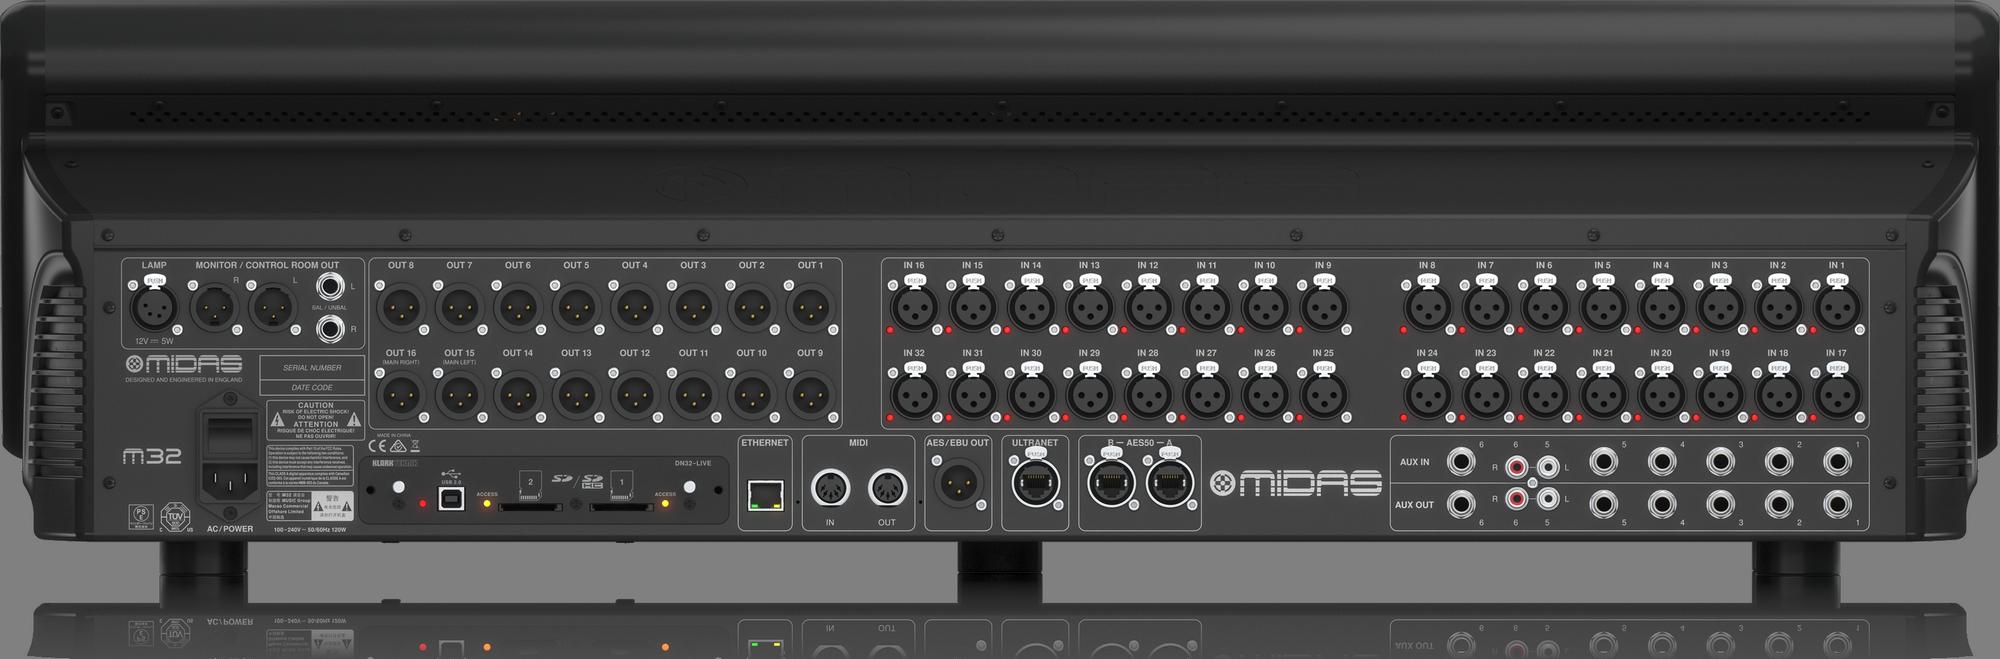 "Midas M32-LIVE ""Version 2"" Digital Mixing Console"